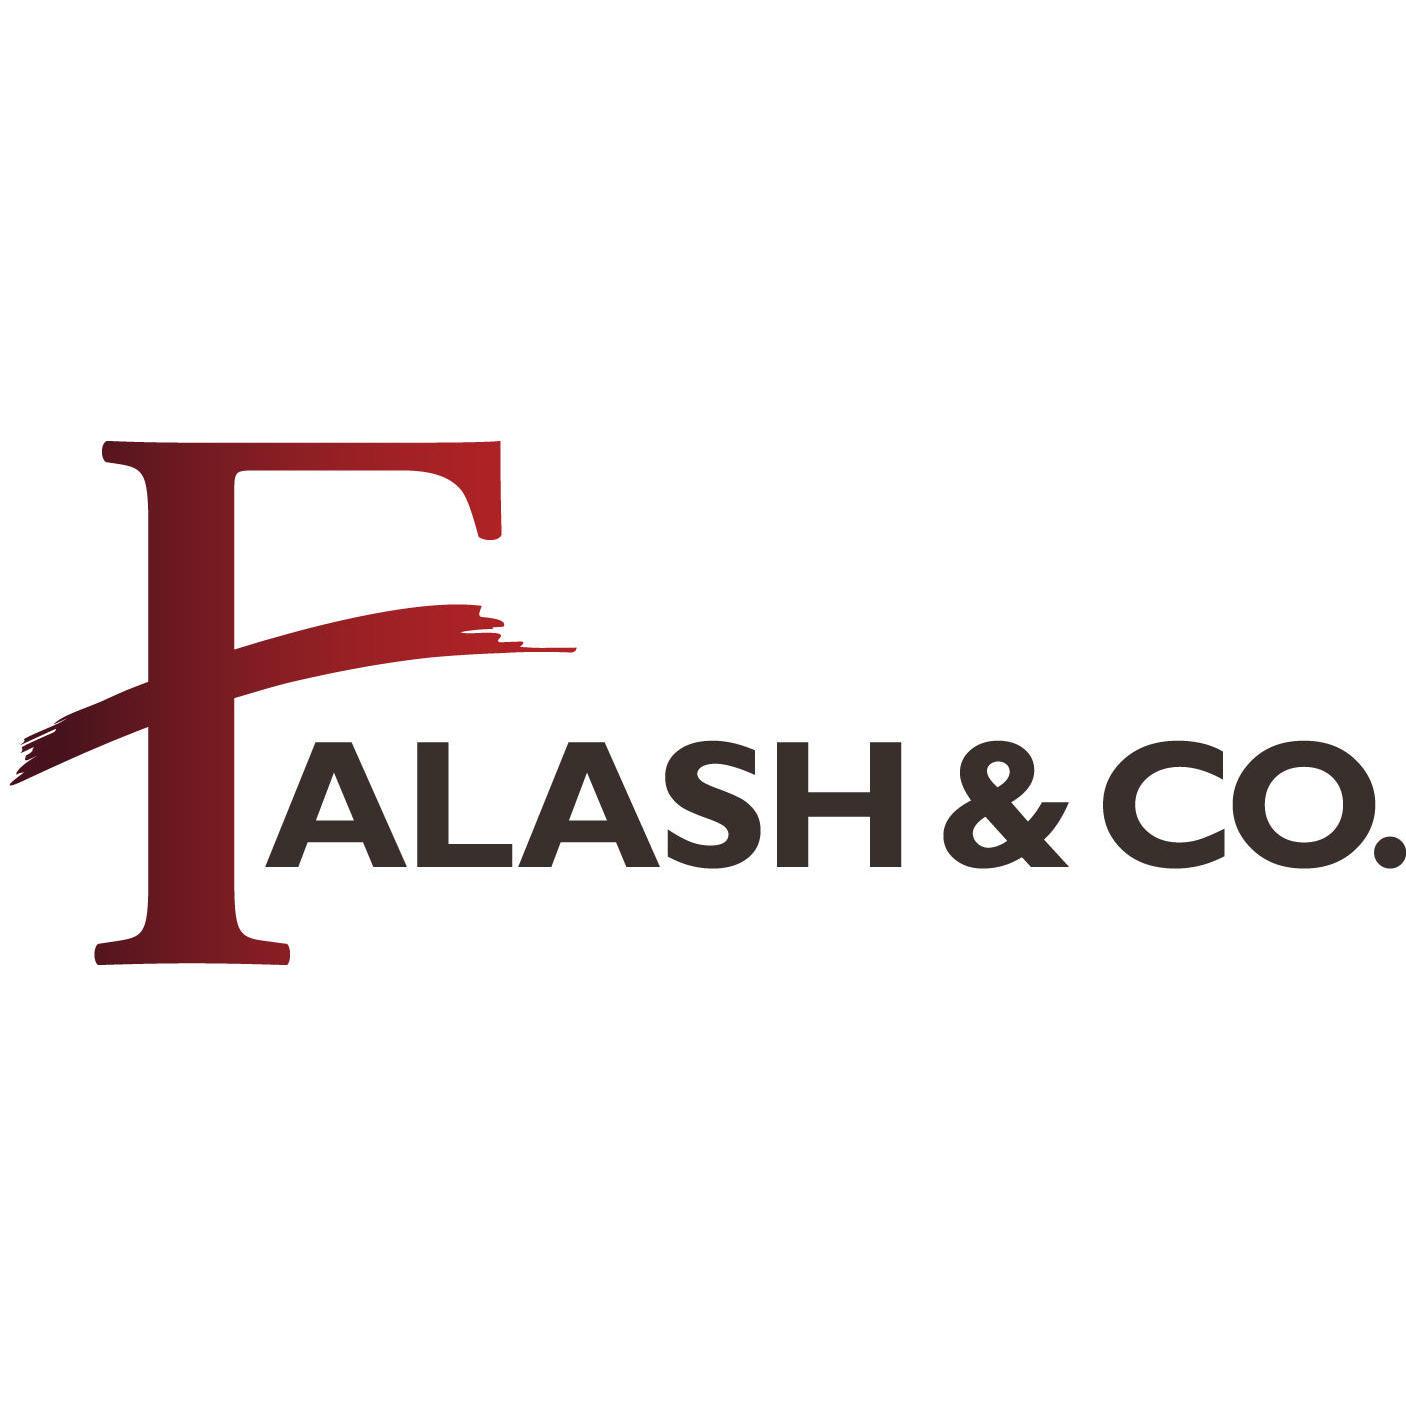 Falash & Co., Inc.